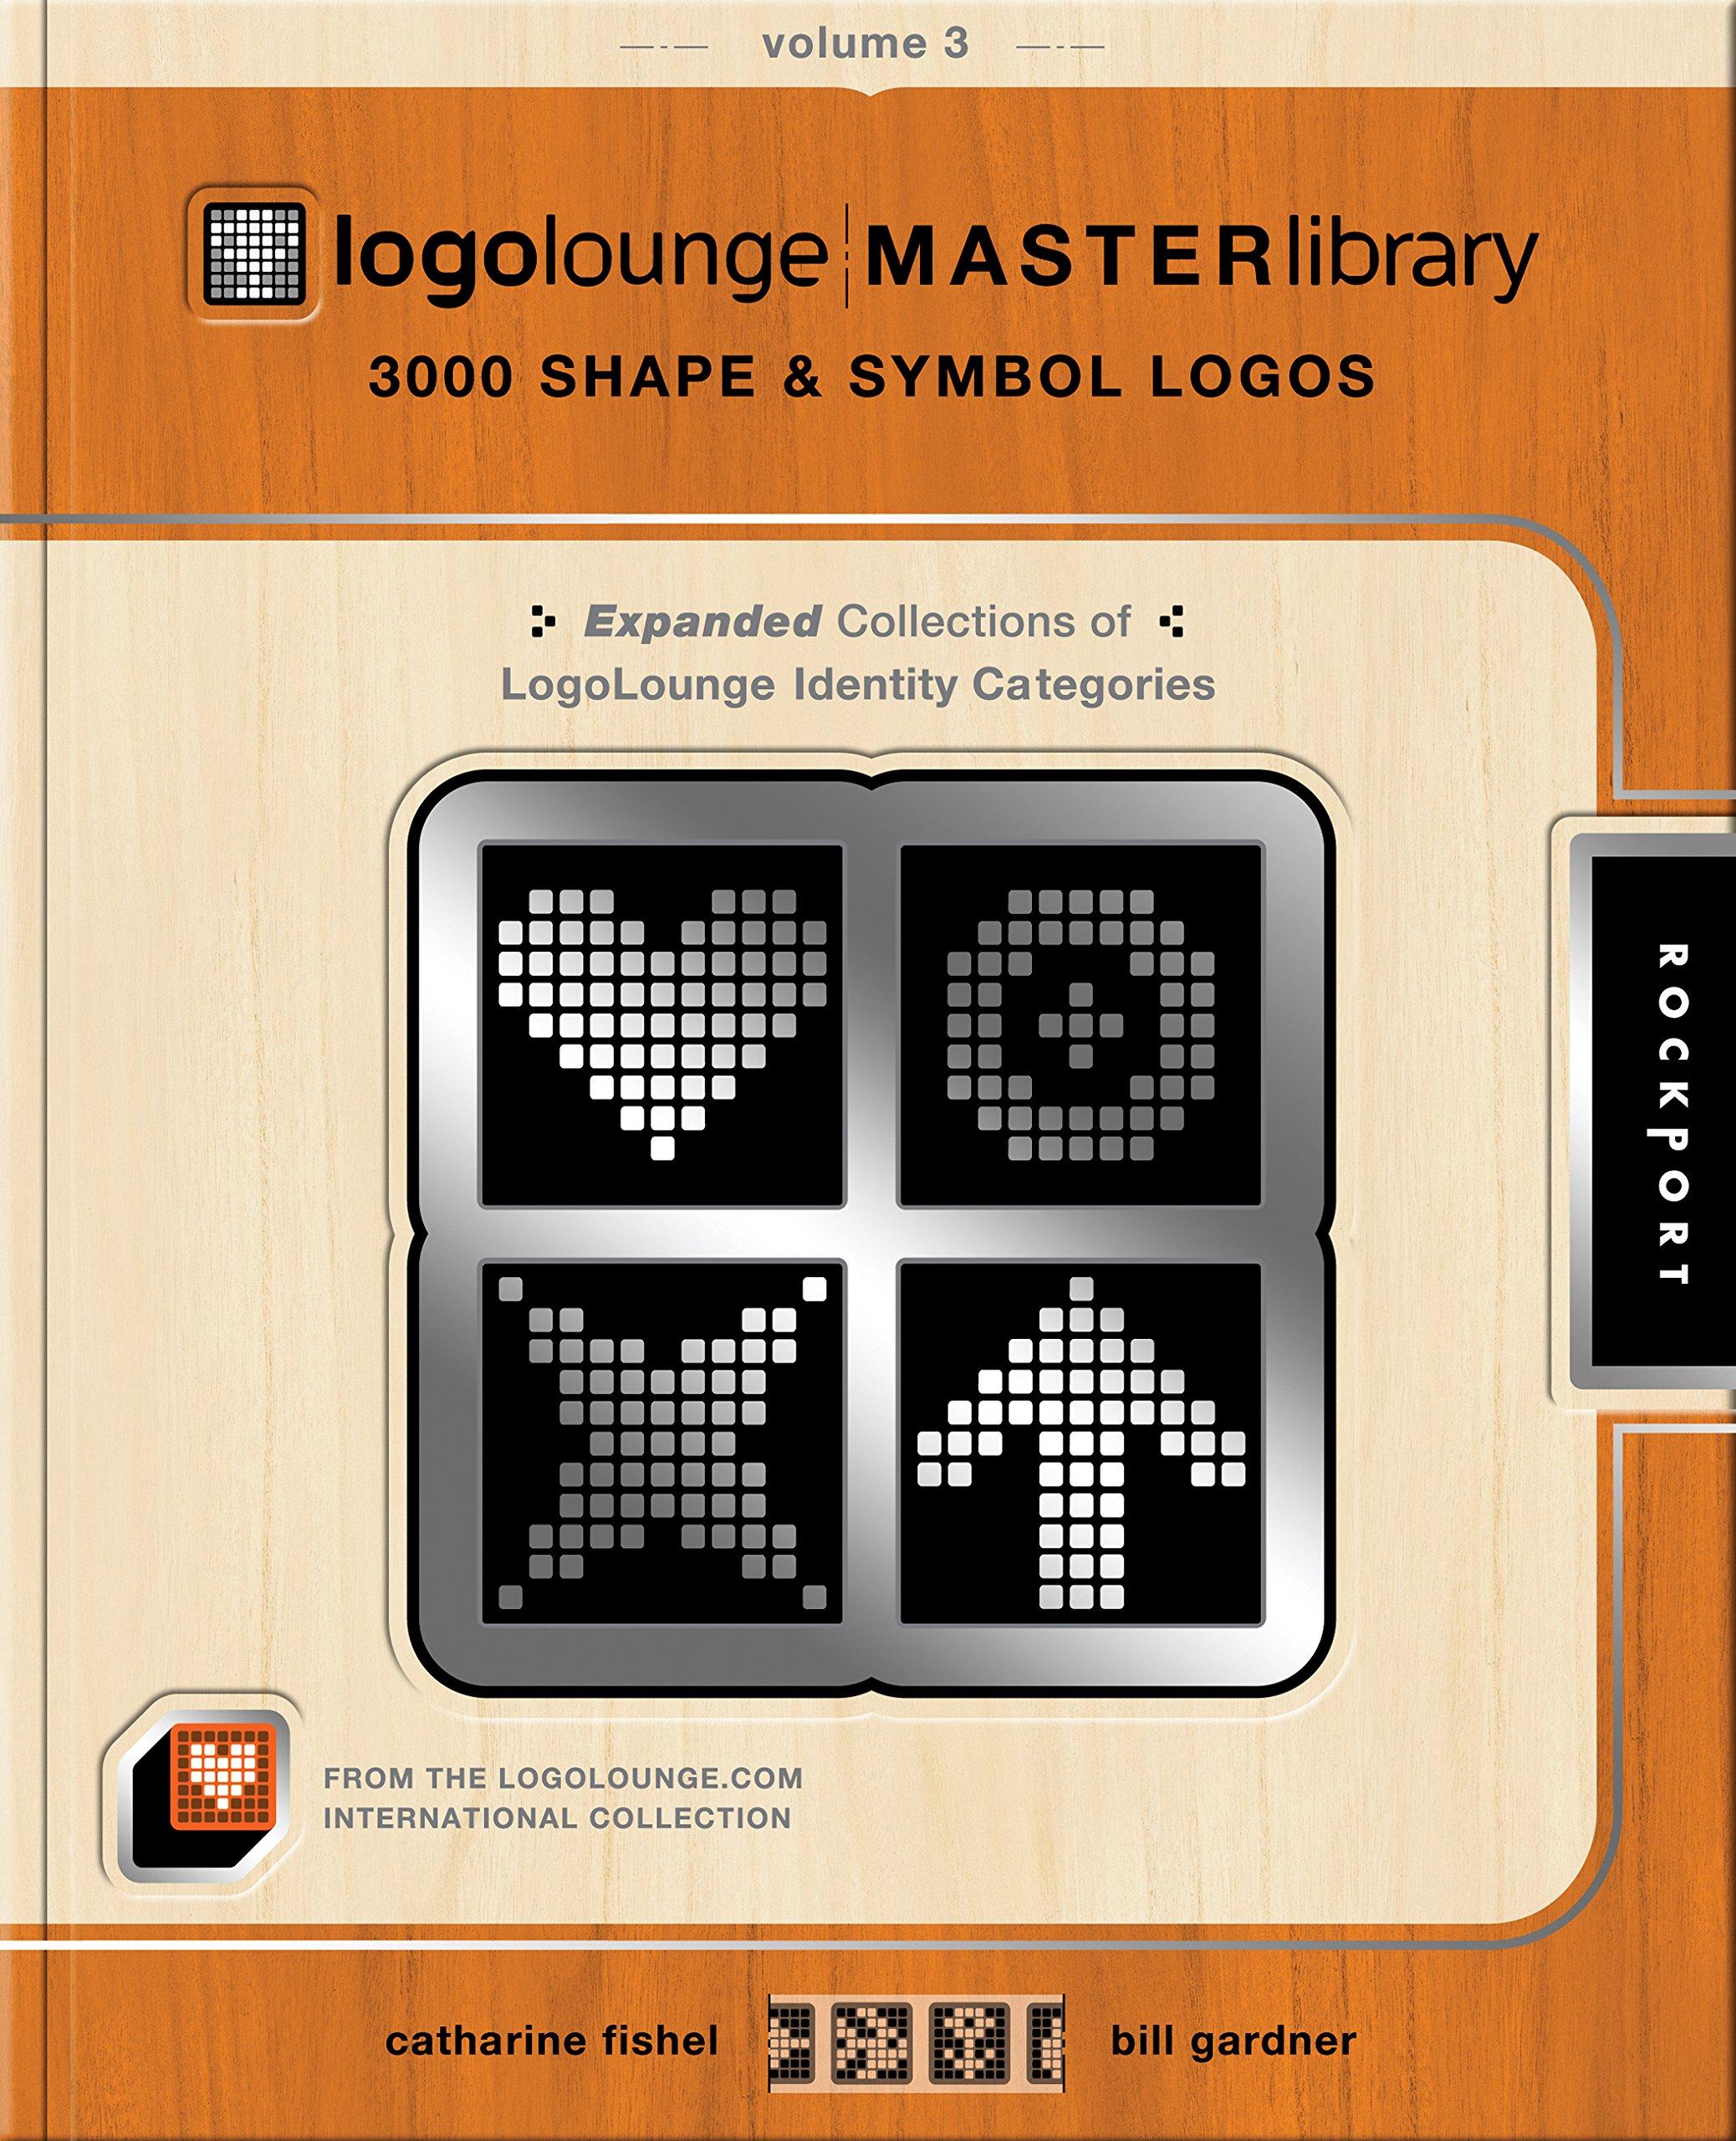 Logolounge Master Library Volume 3 3 000 Shapes And Symbols Logos